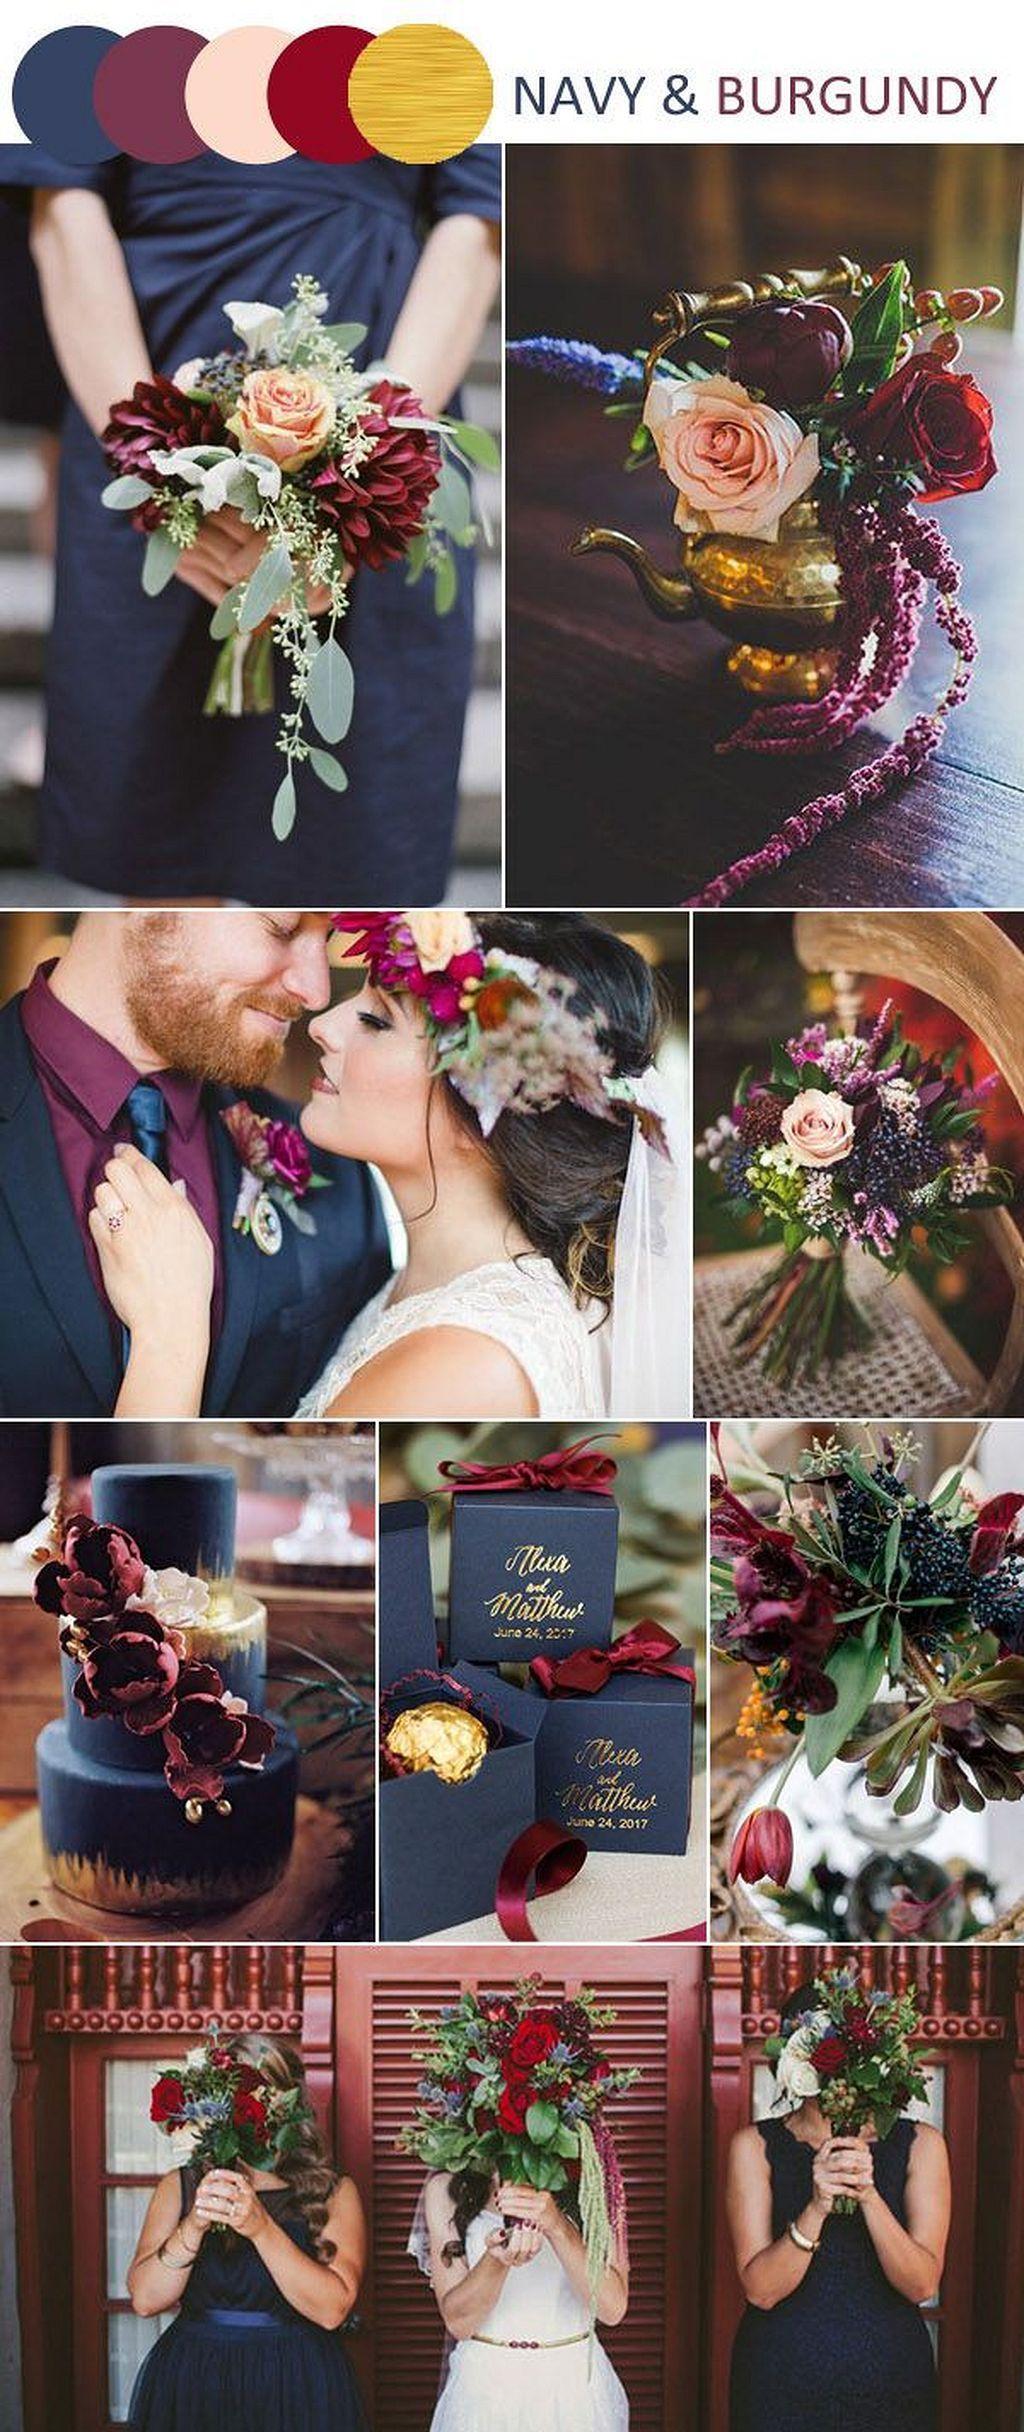 Lace t shirt wedding dress november 2018  Best Navy Blue Party Decorations